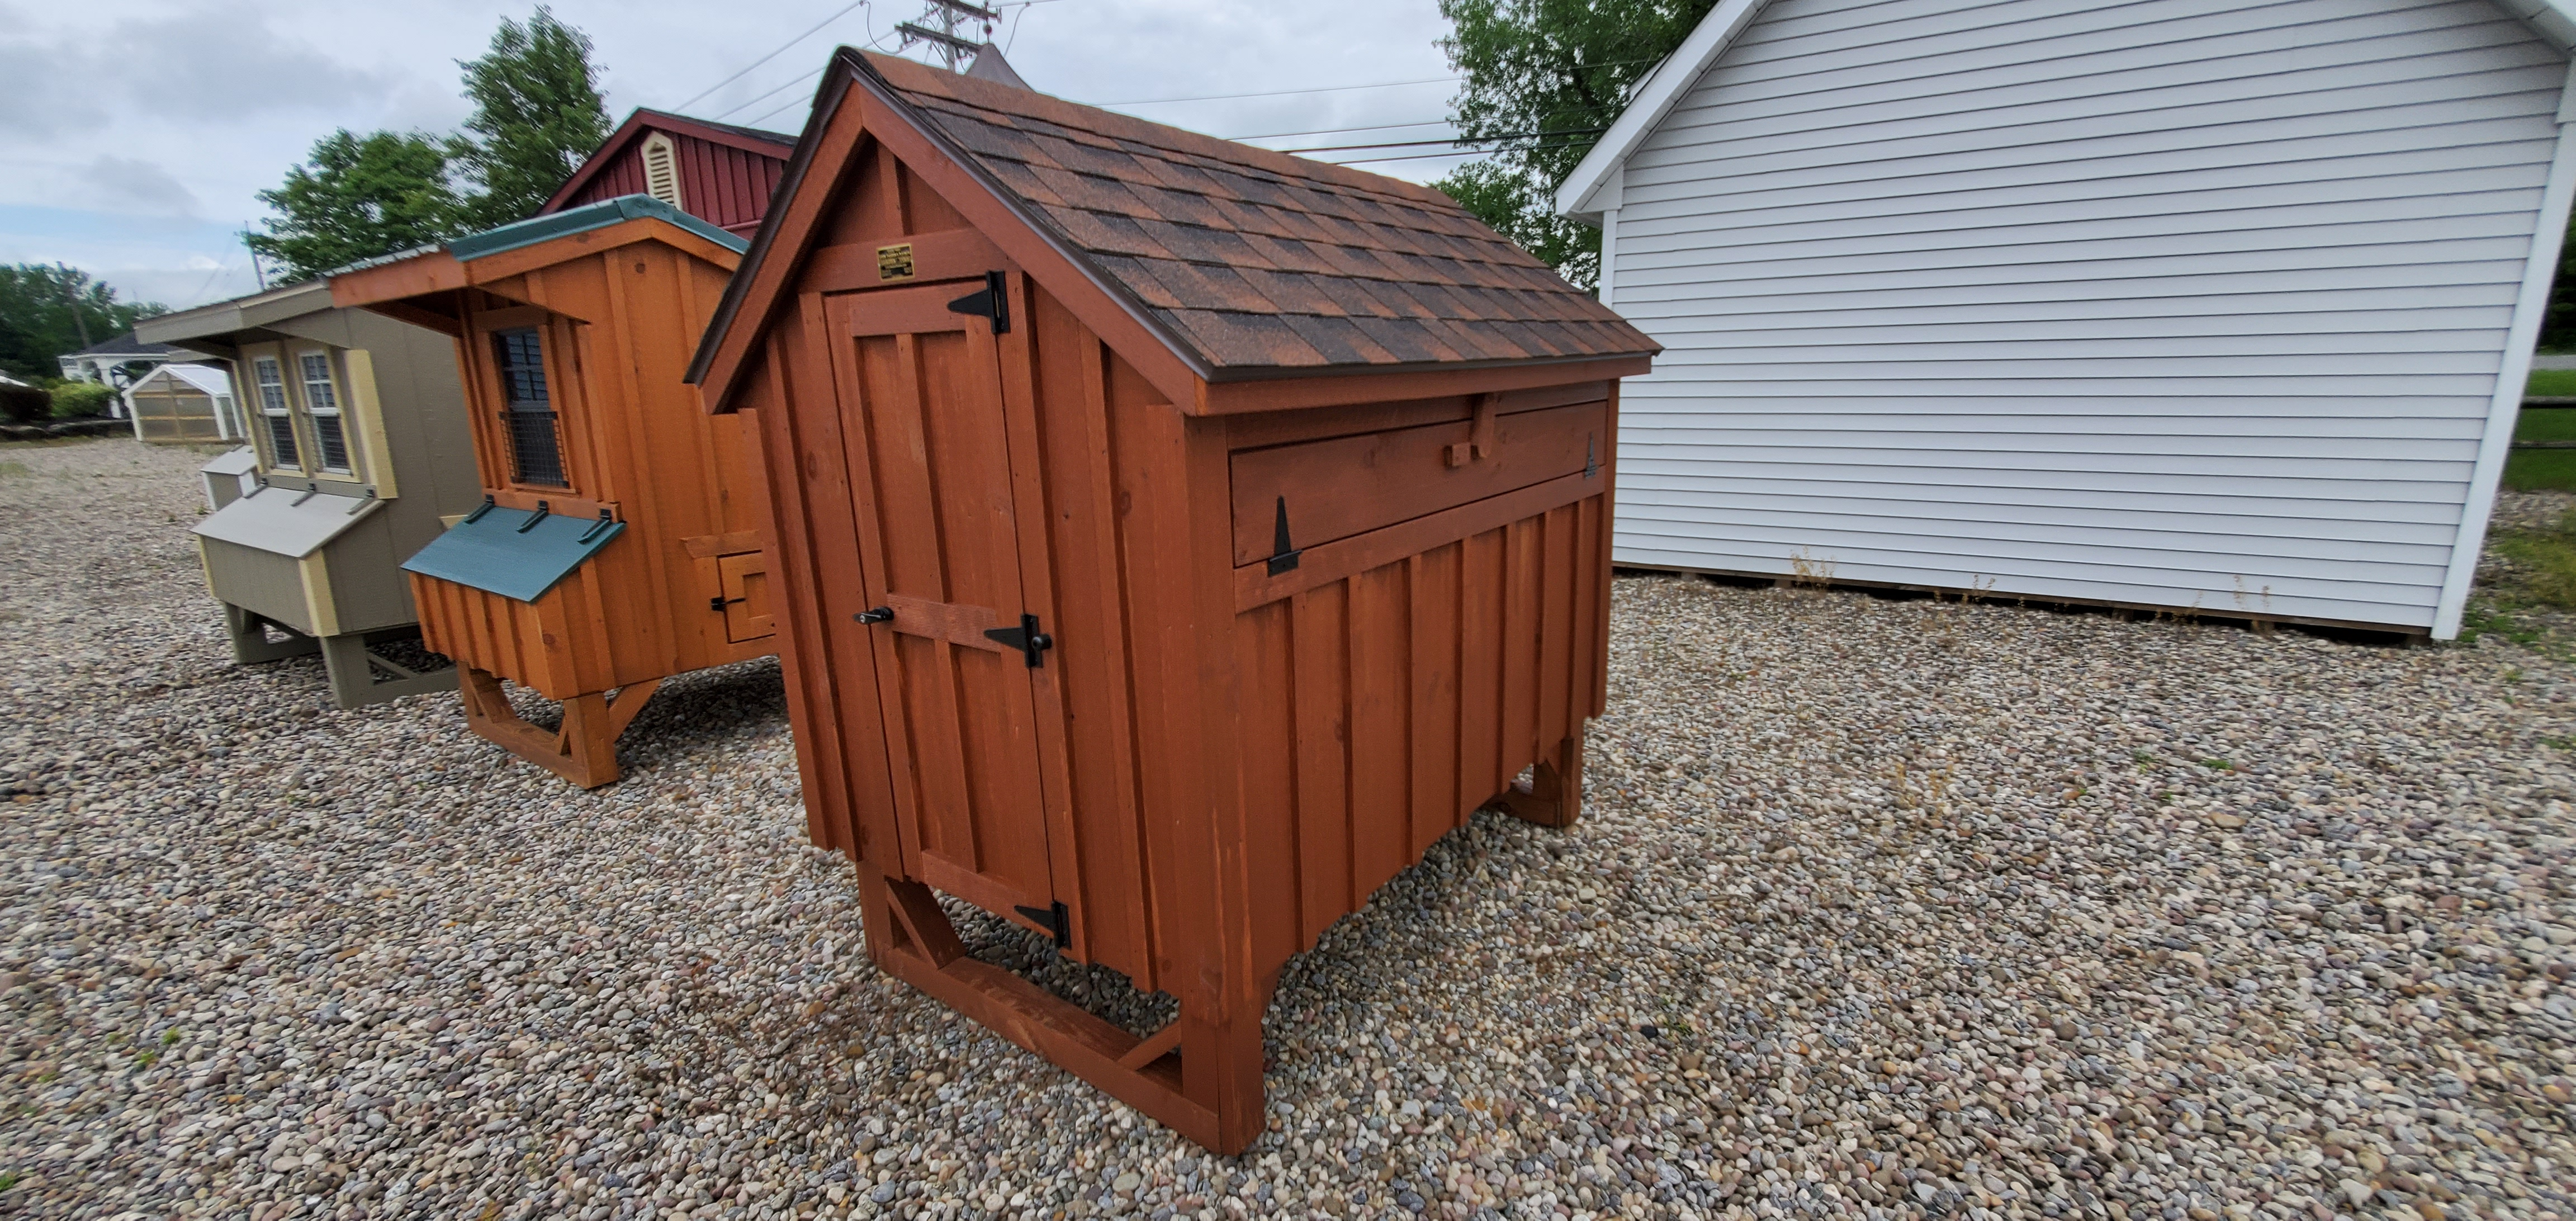 04' X 06' B&b Chicken Coop : Image 2